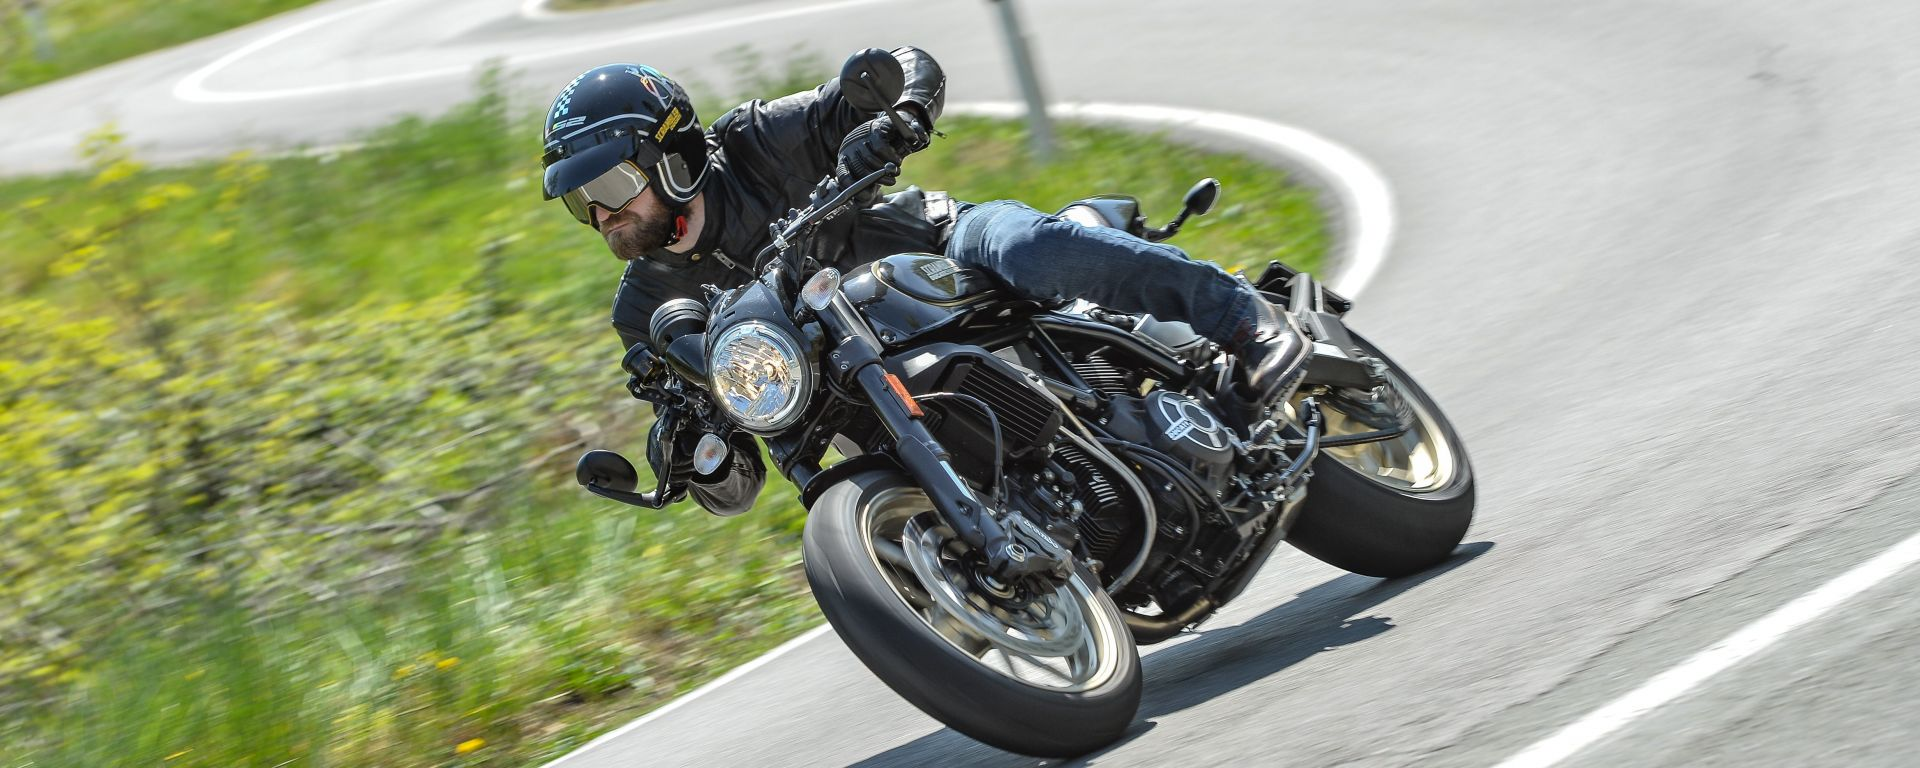 Ducati Scrambler Café Racer, anima brillante